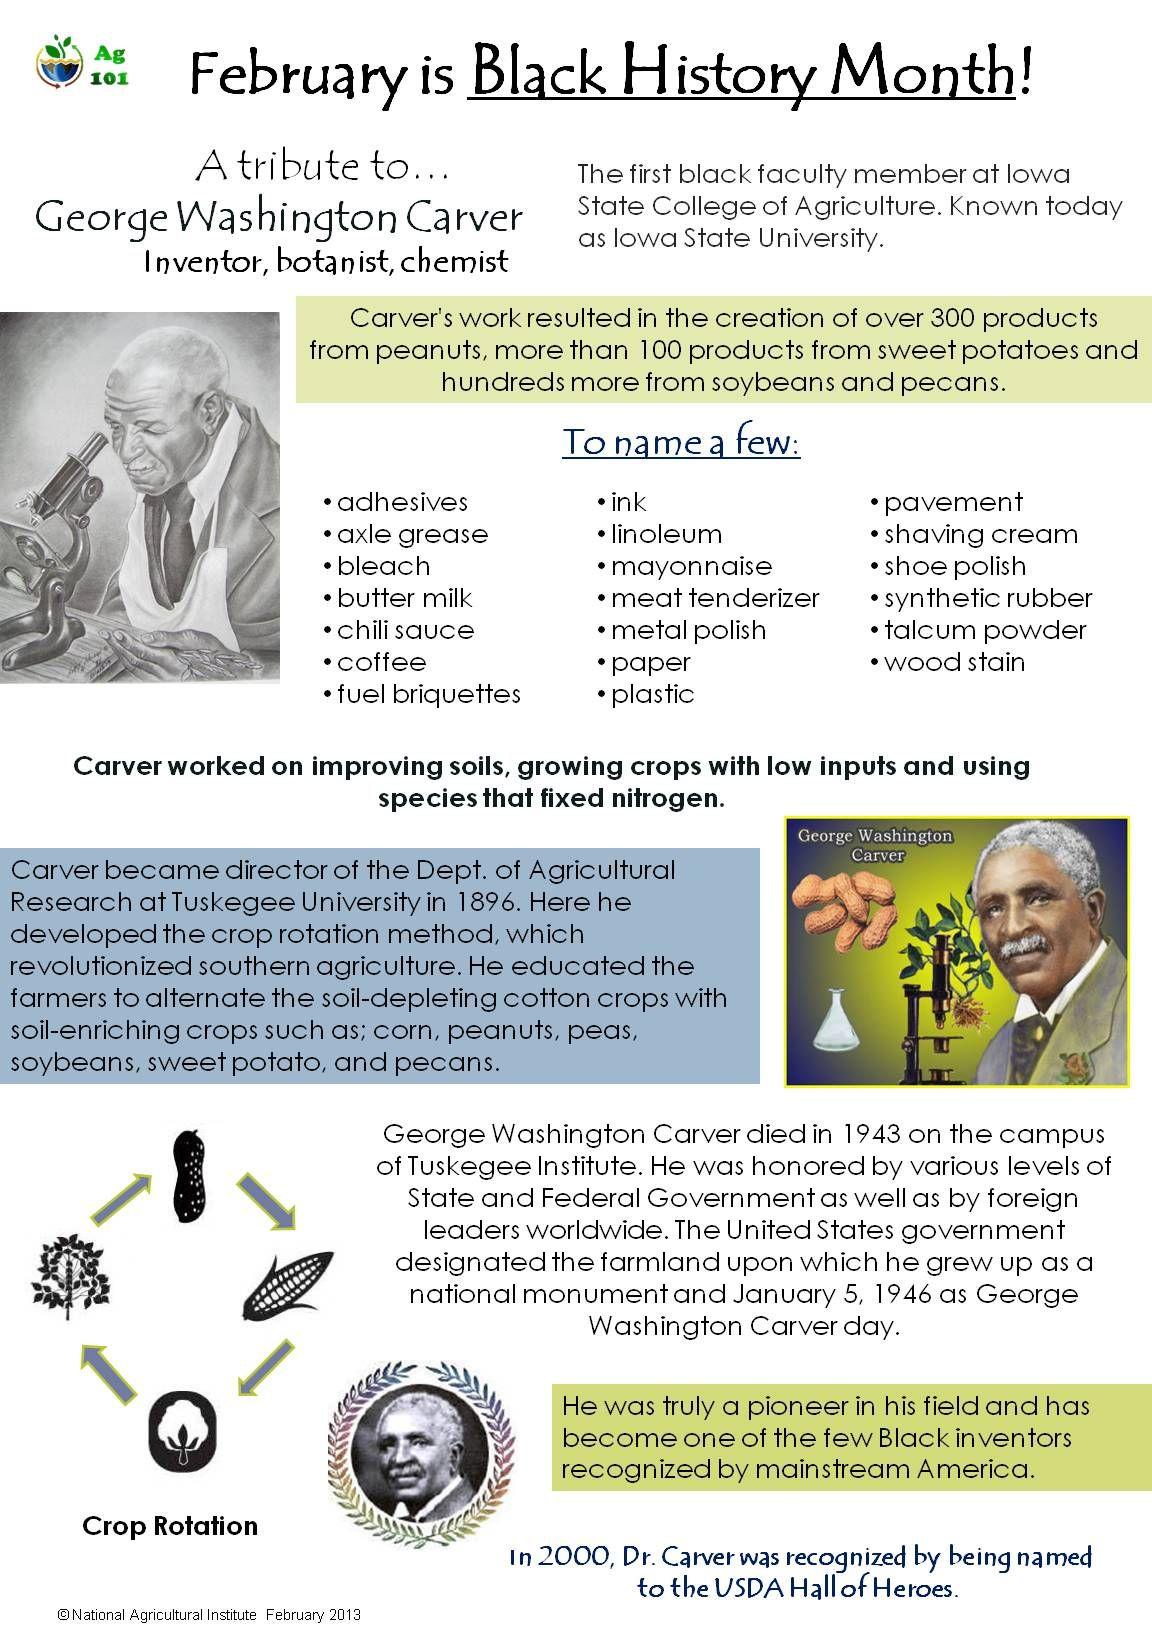 George Washington Carver Inventor